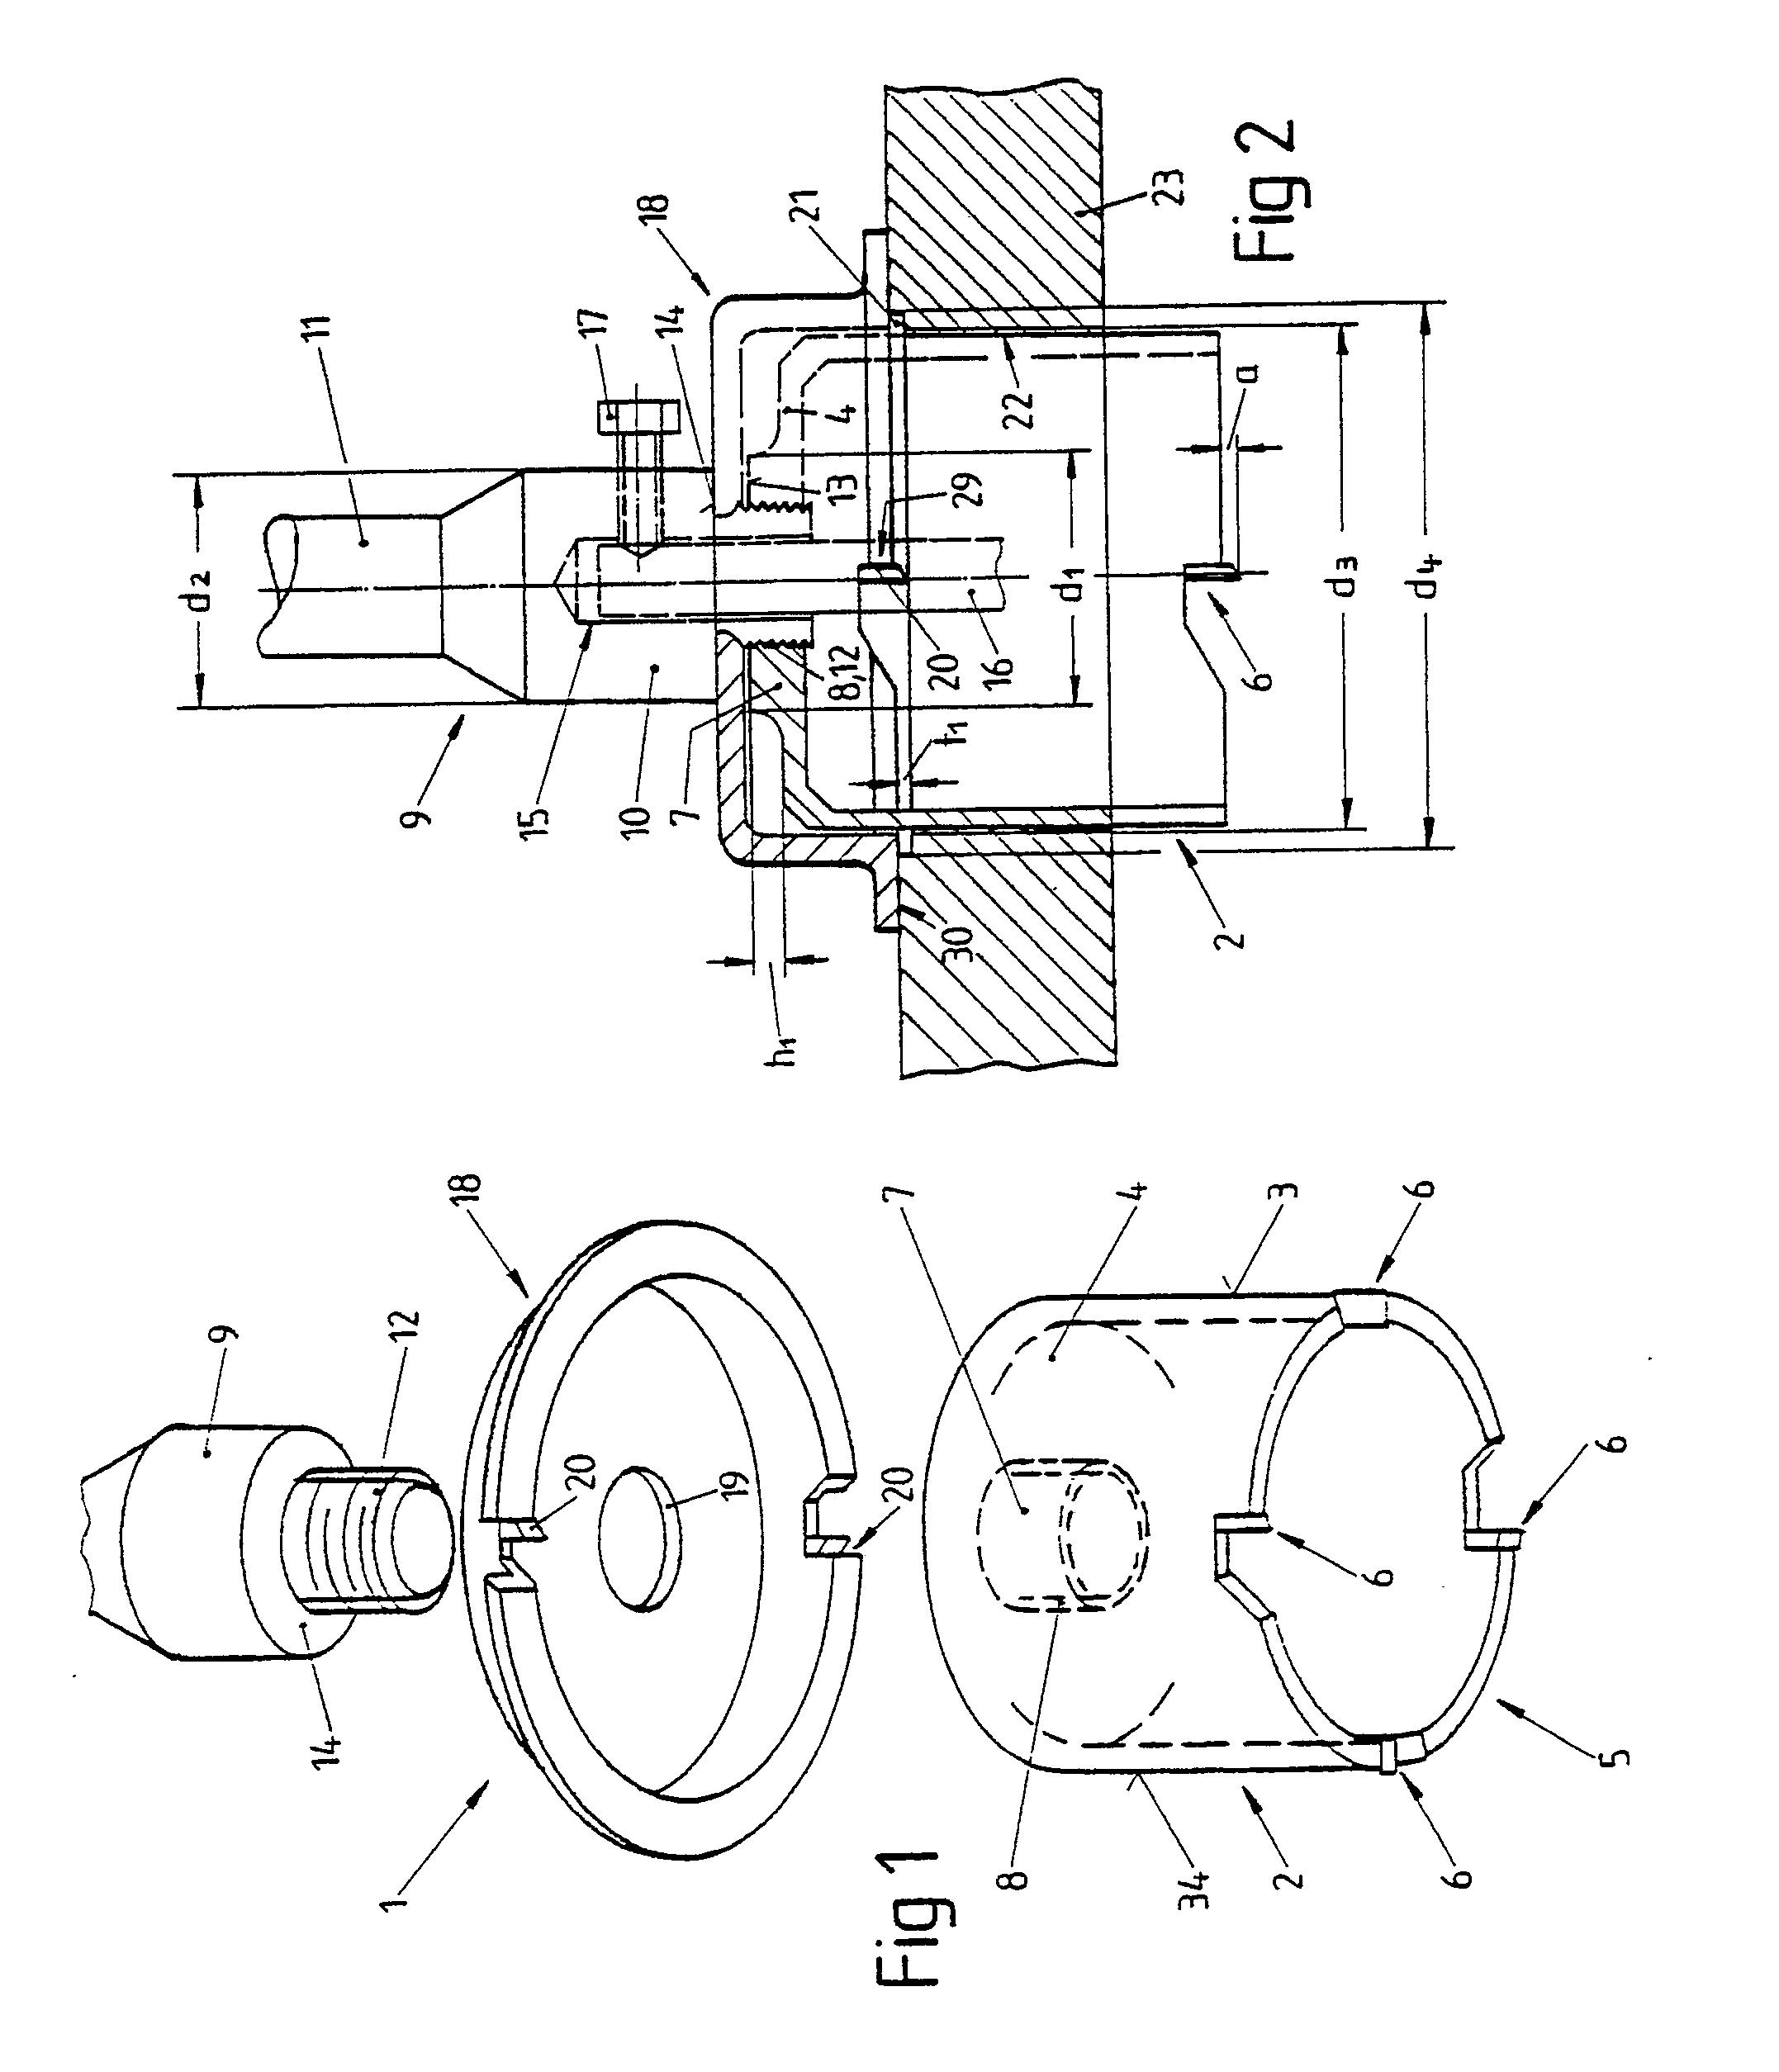 patent ep0458047a1 fr skrone google patents. Black Bedroom Furniture Sets. Home Design Ideas